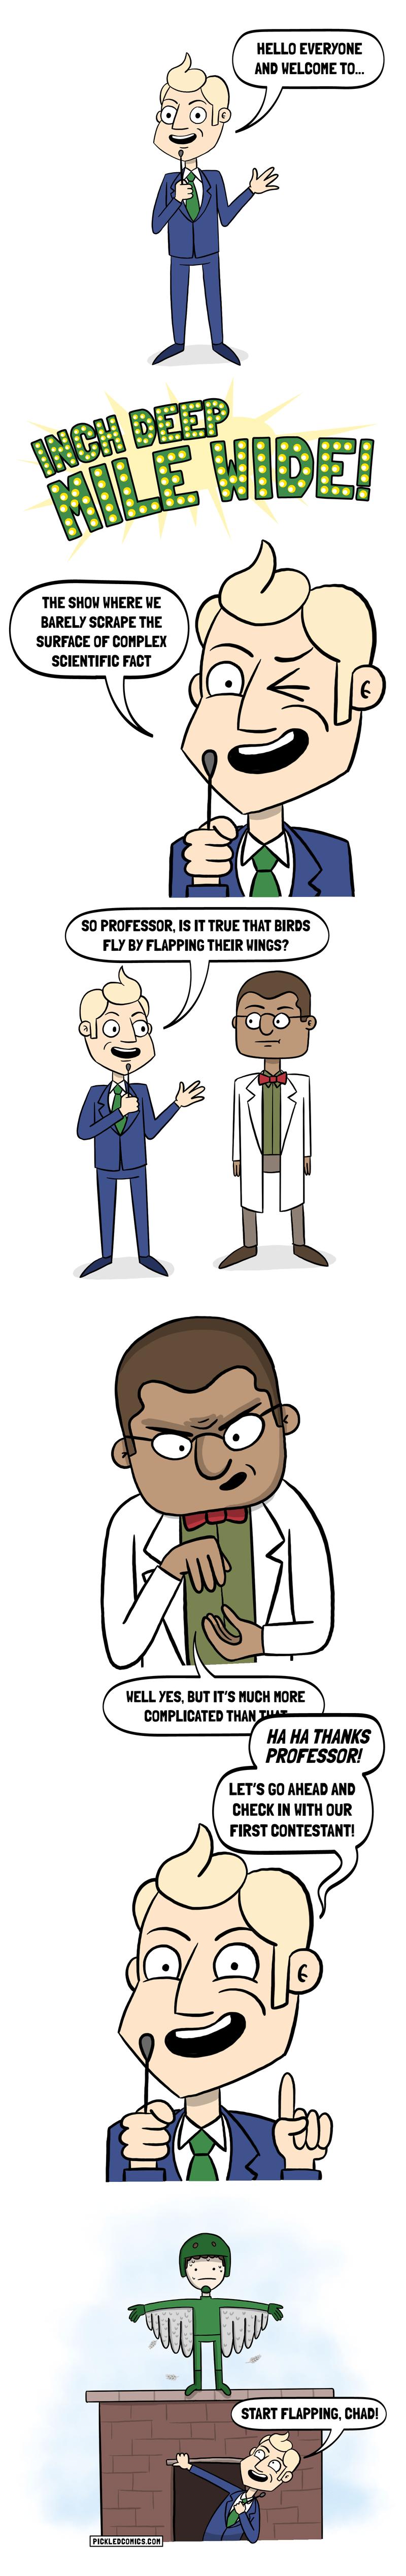 TV science web comics - 8753531904